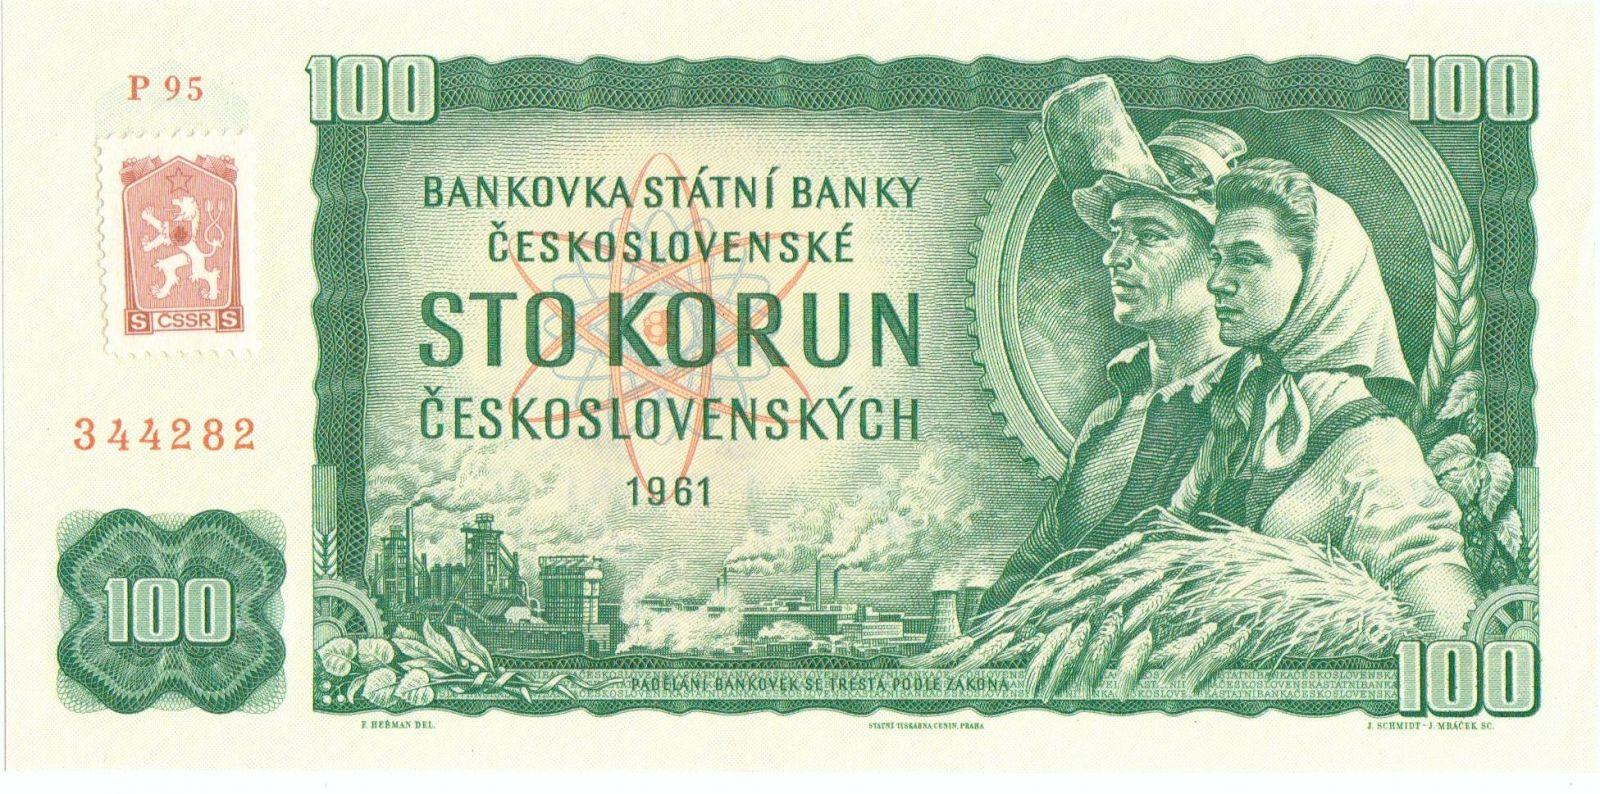 100Kčs/1961-kolek tzv. Kubánské krize/, stav UNC, série P